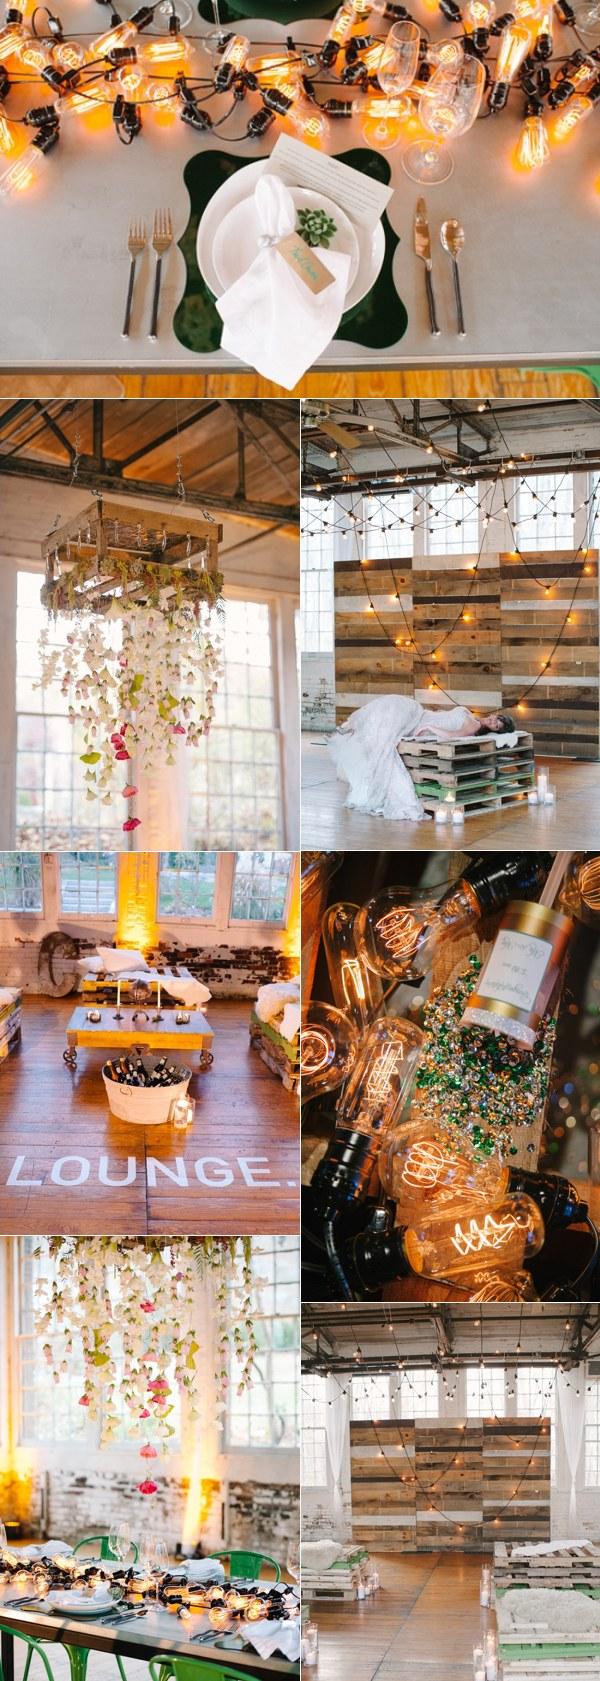 rustic illuminated industrial wedding ideas